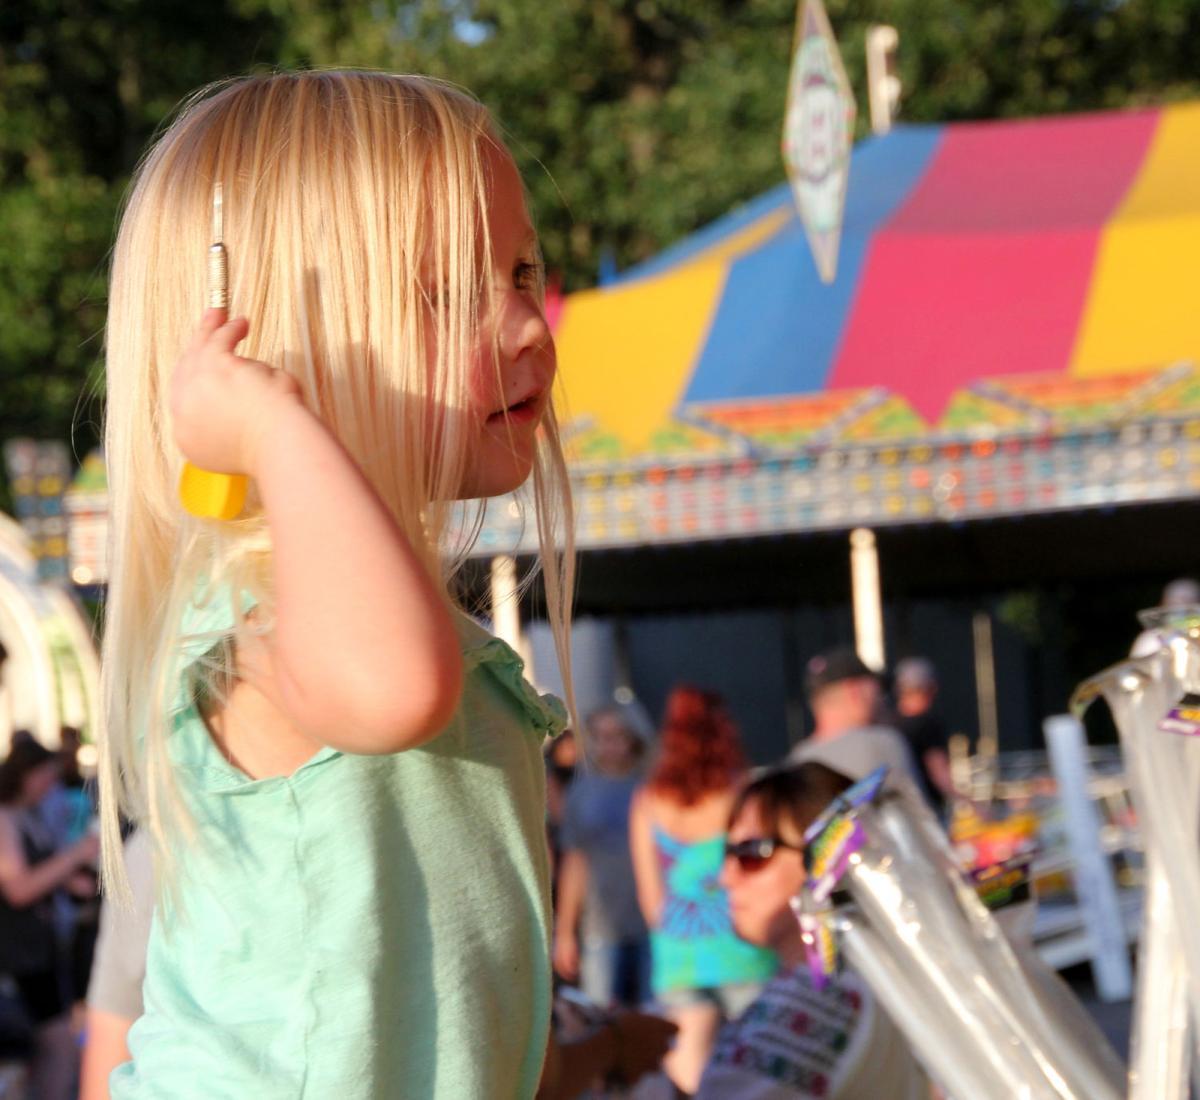 carnival rory burris.JPG